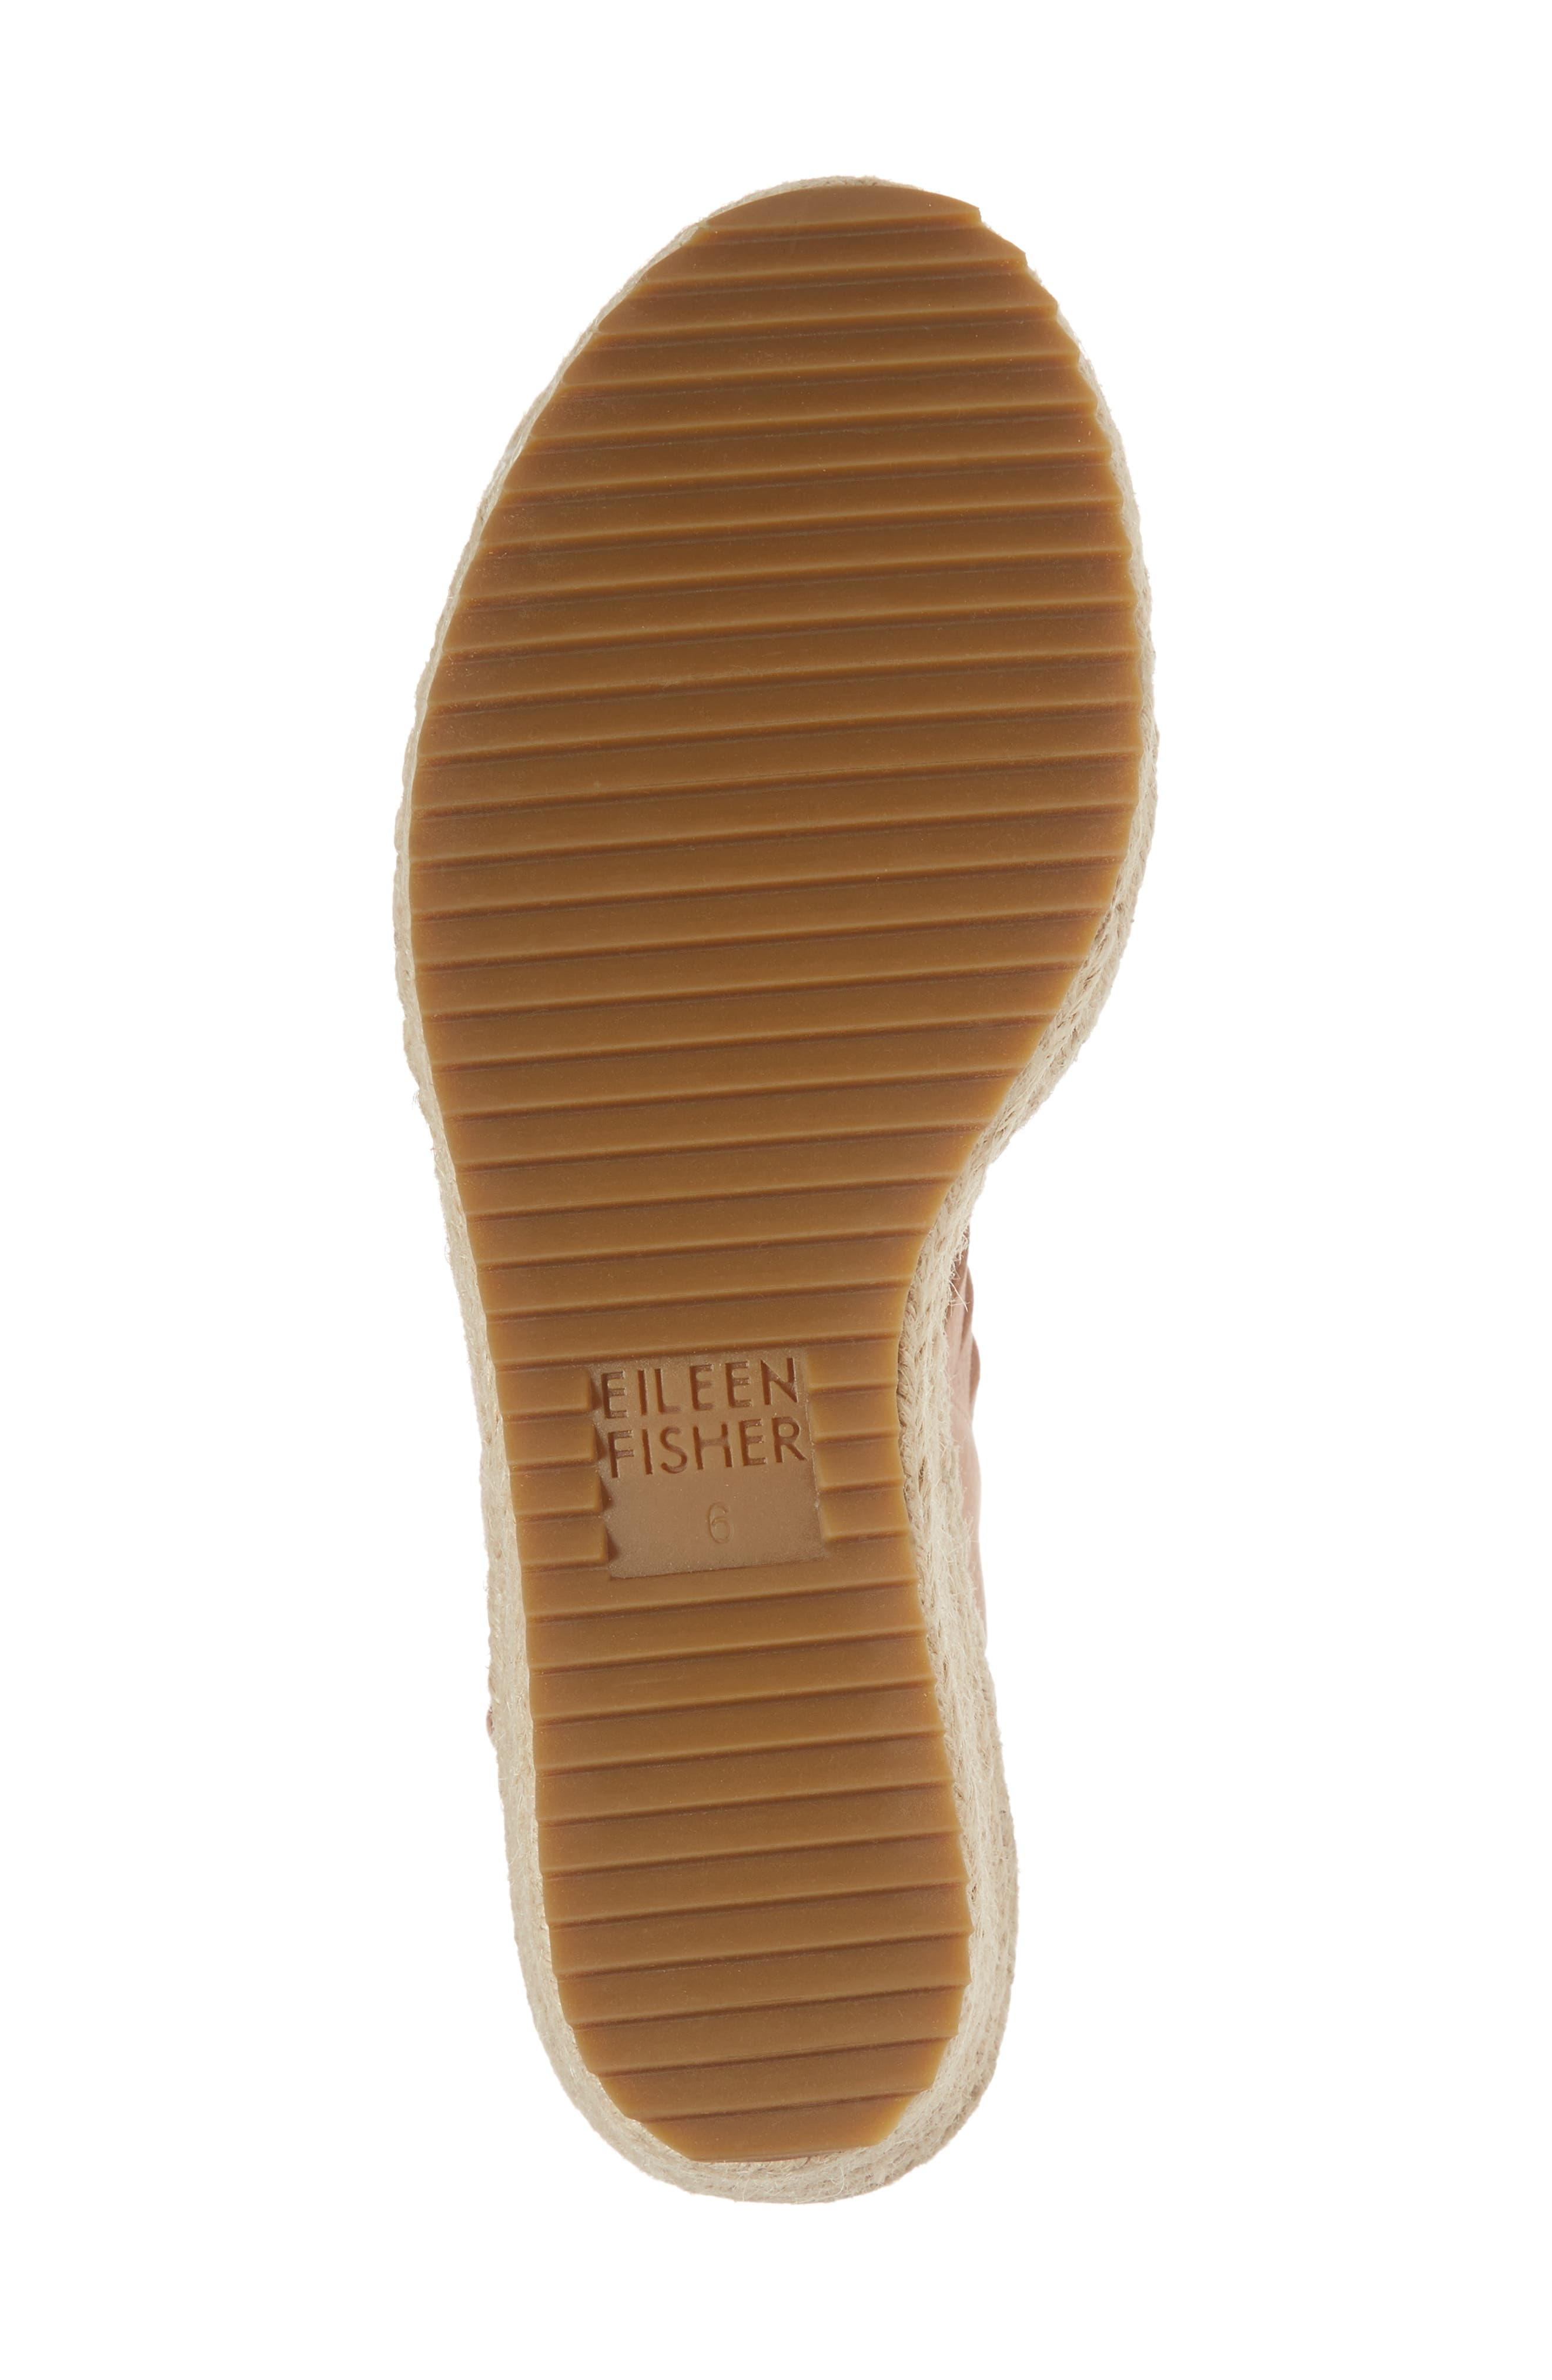 Largo Espadrille Wedge Sandal,                             Alternate thumbnail 6, color,                             Toffee Cream Nubuck